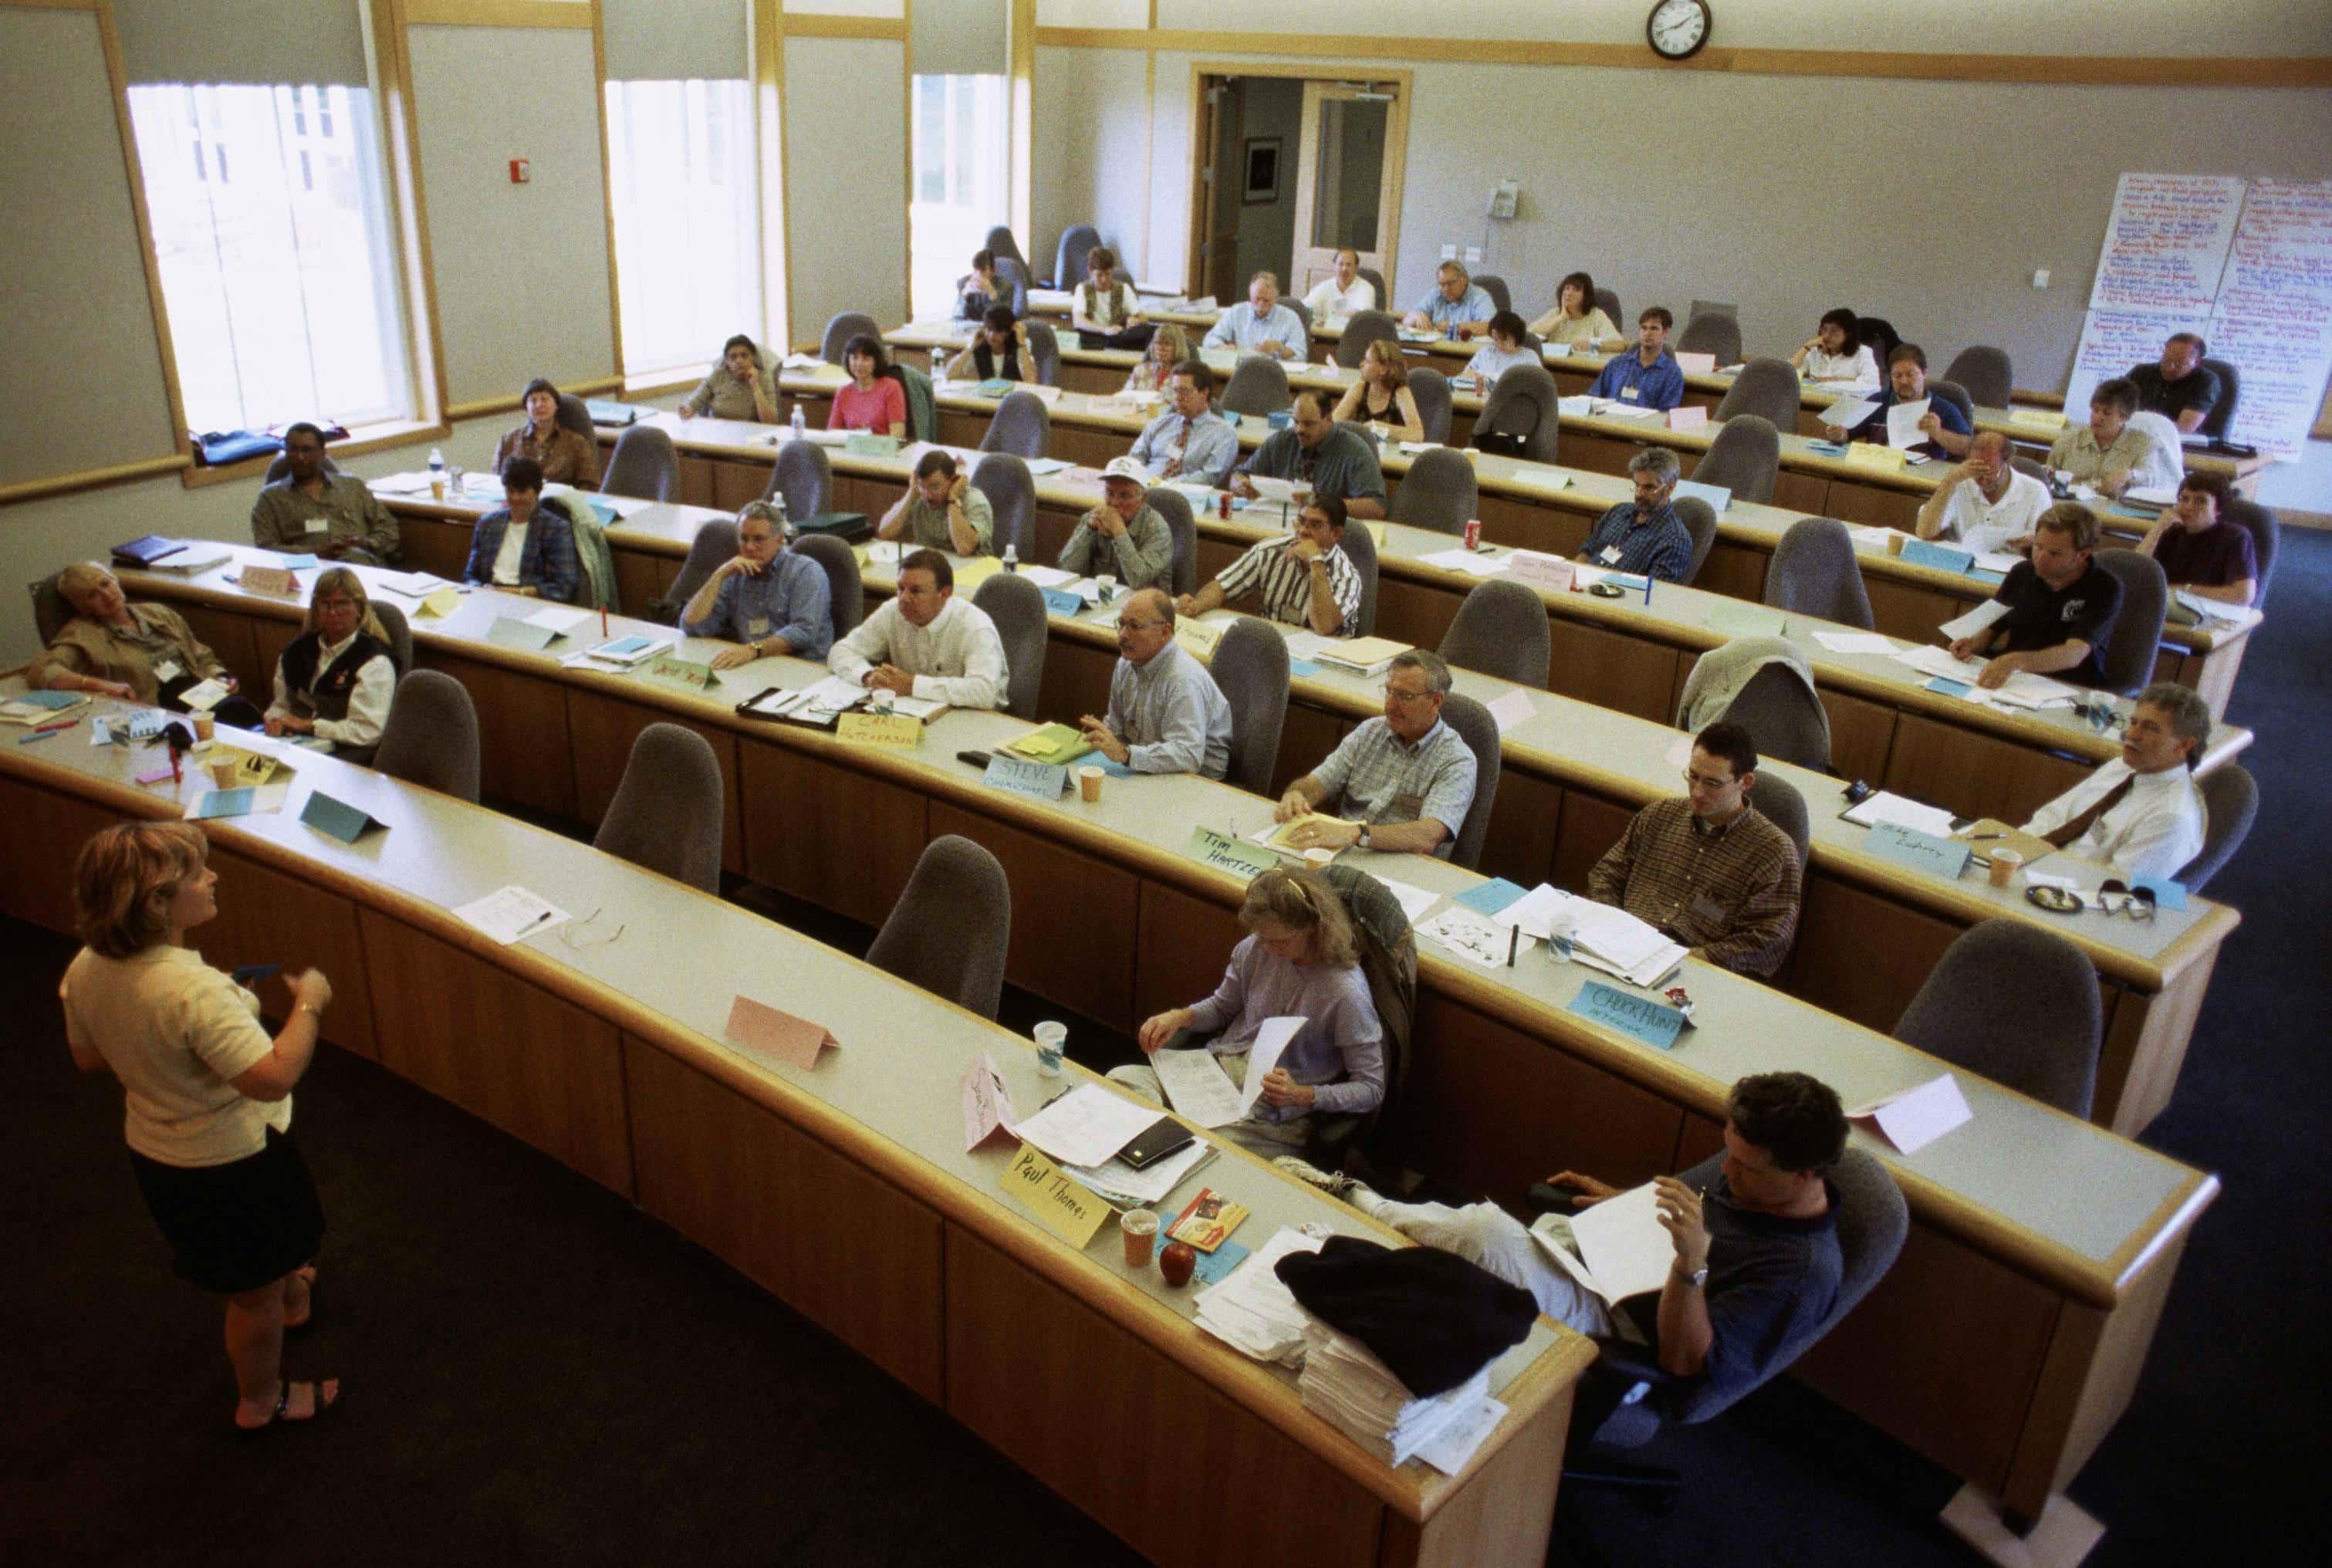 Instruction Methodology For Multi-Generational Classrooms